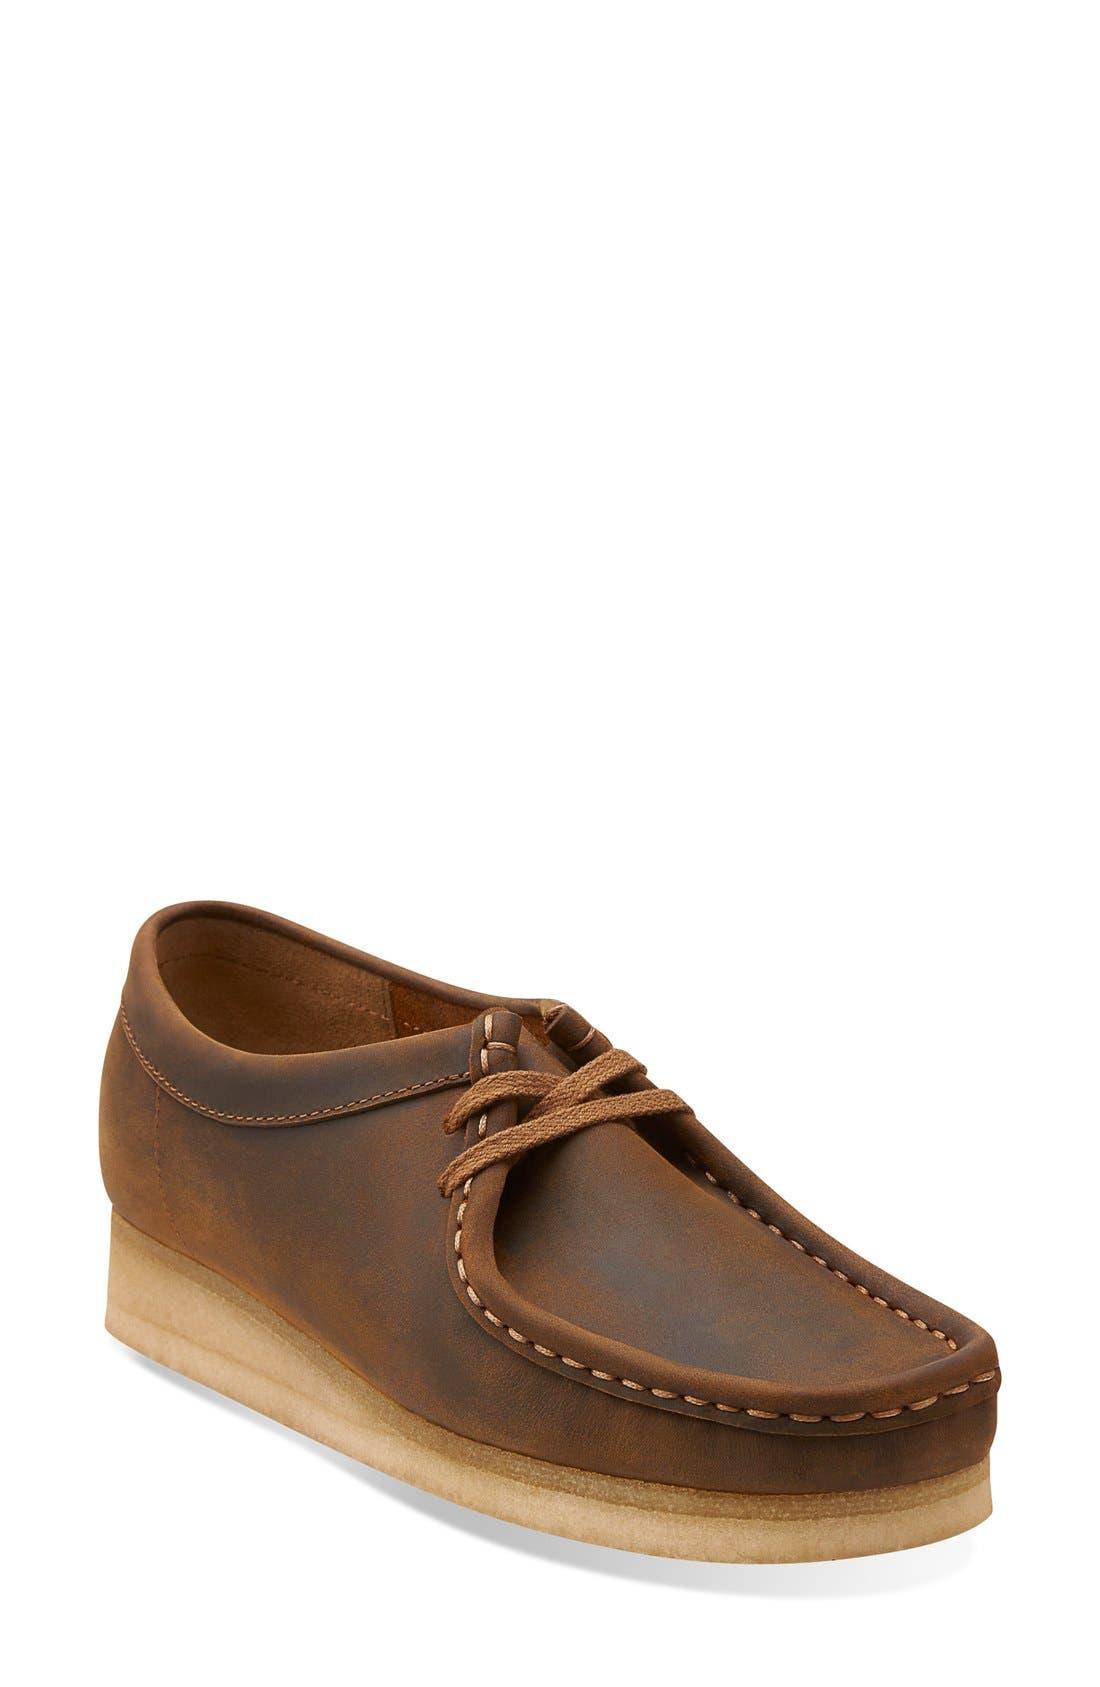 'Wallabee' Chukka Boot,                         Main,                         color, Beeswax Leather